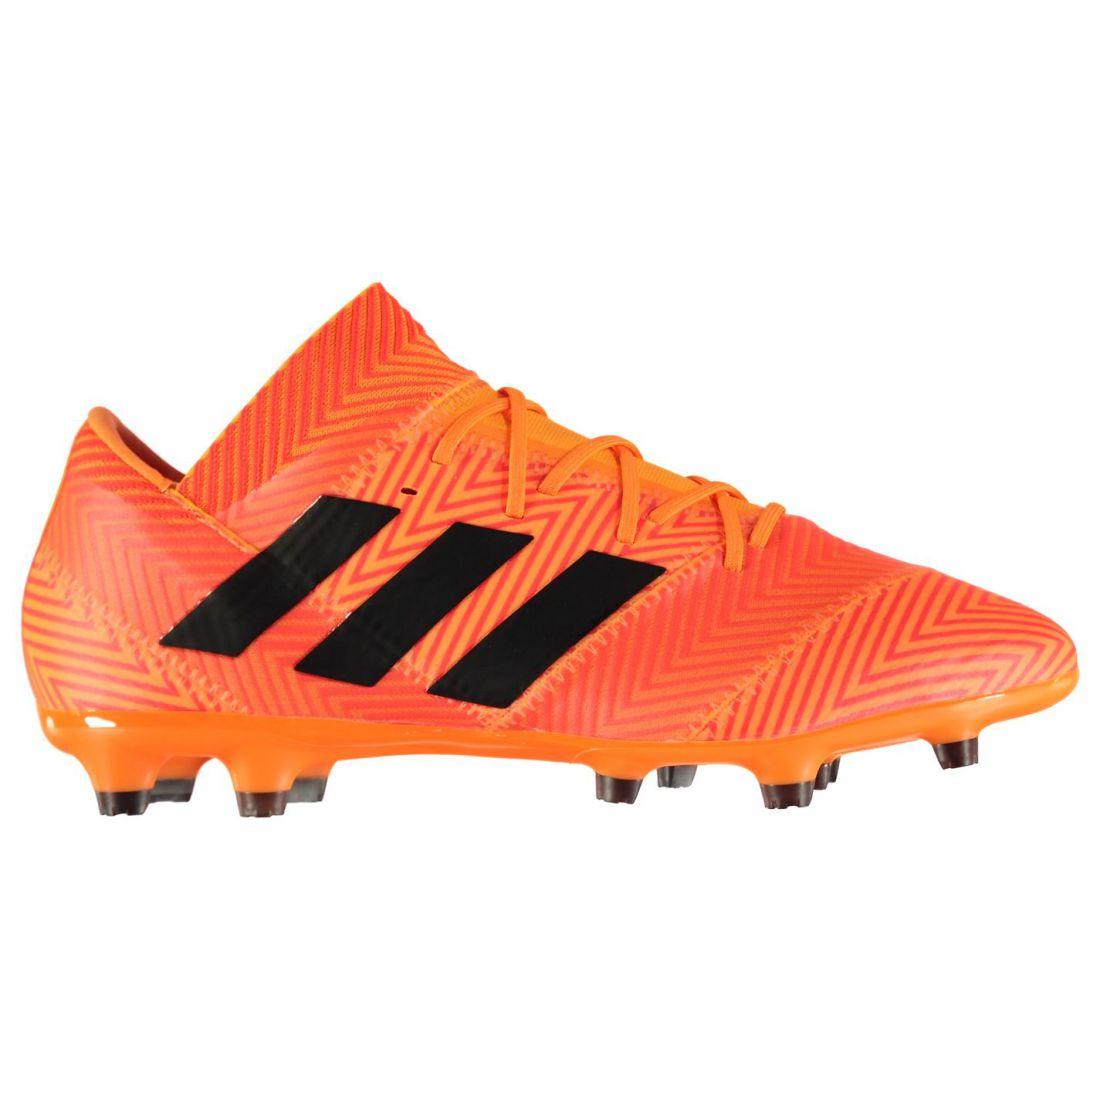 fe3d53042b7 adidas Nemeziz 18.2 FG Football Boots Mens Gents Firm Ground Laces ...